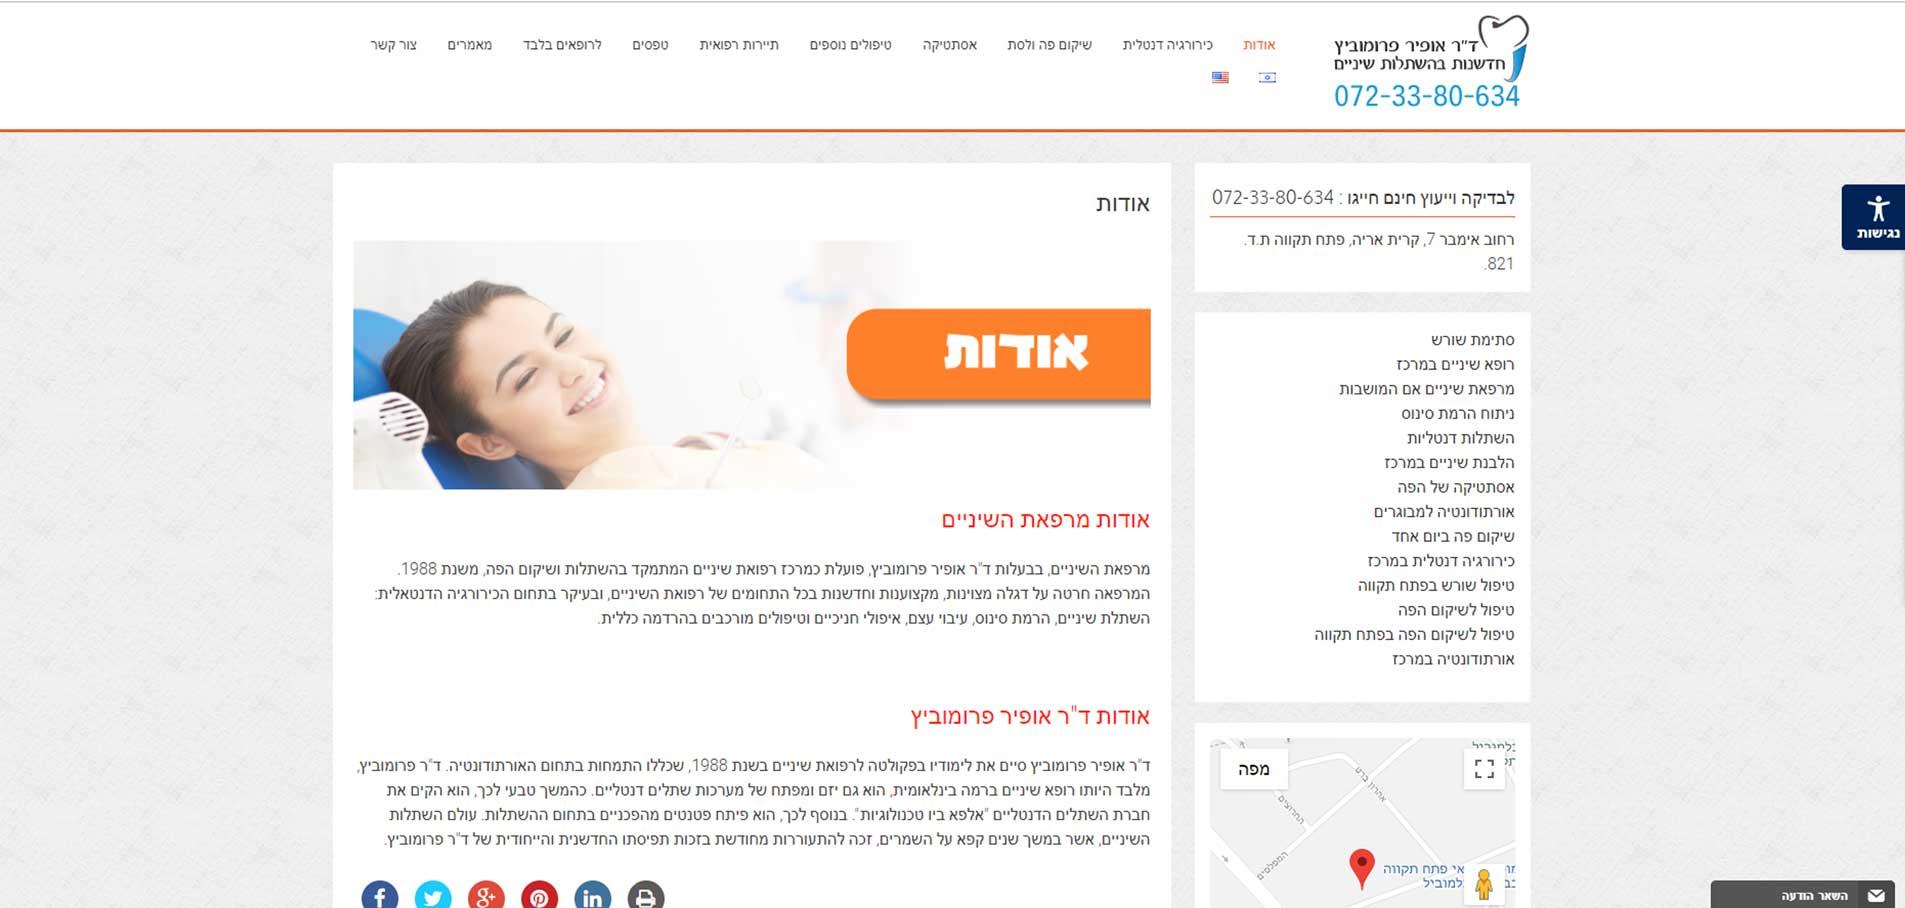 Dr.Ophir Fromovich website - inner webpage